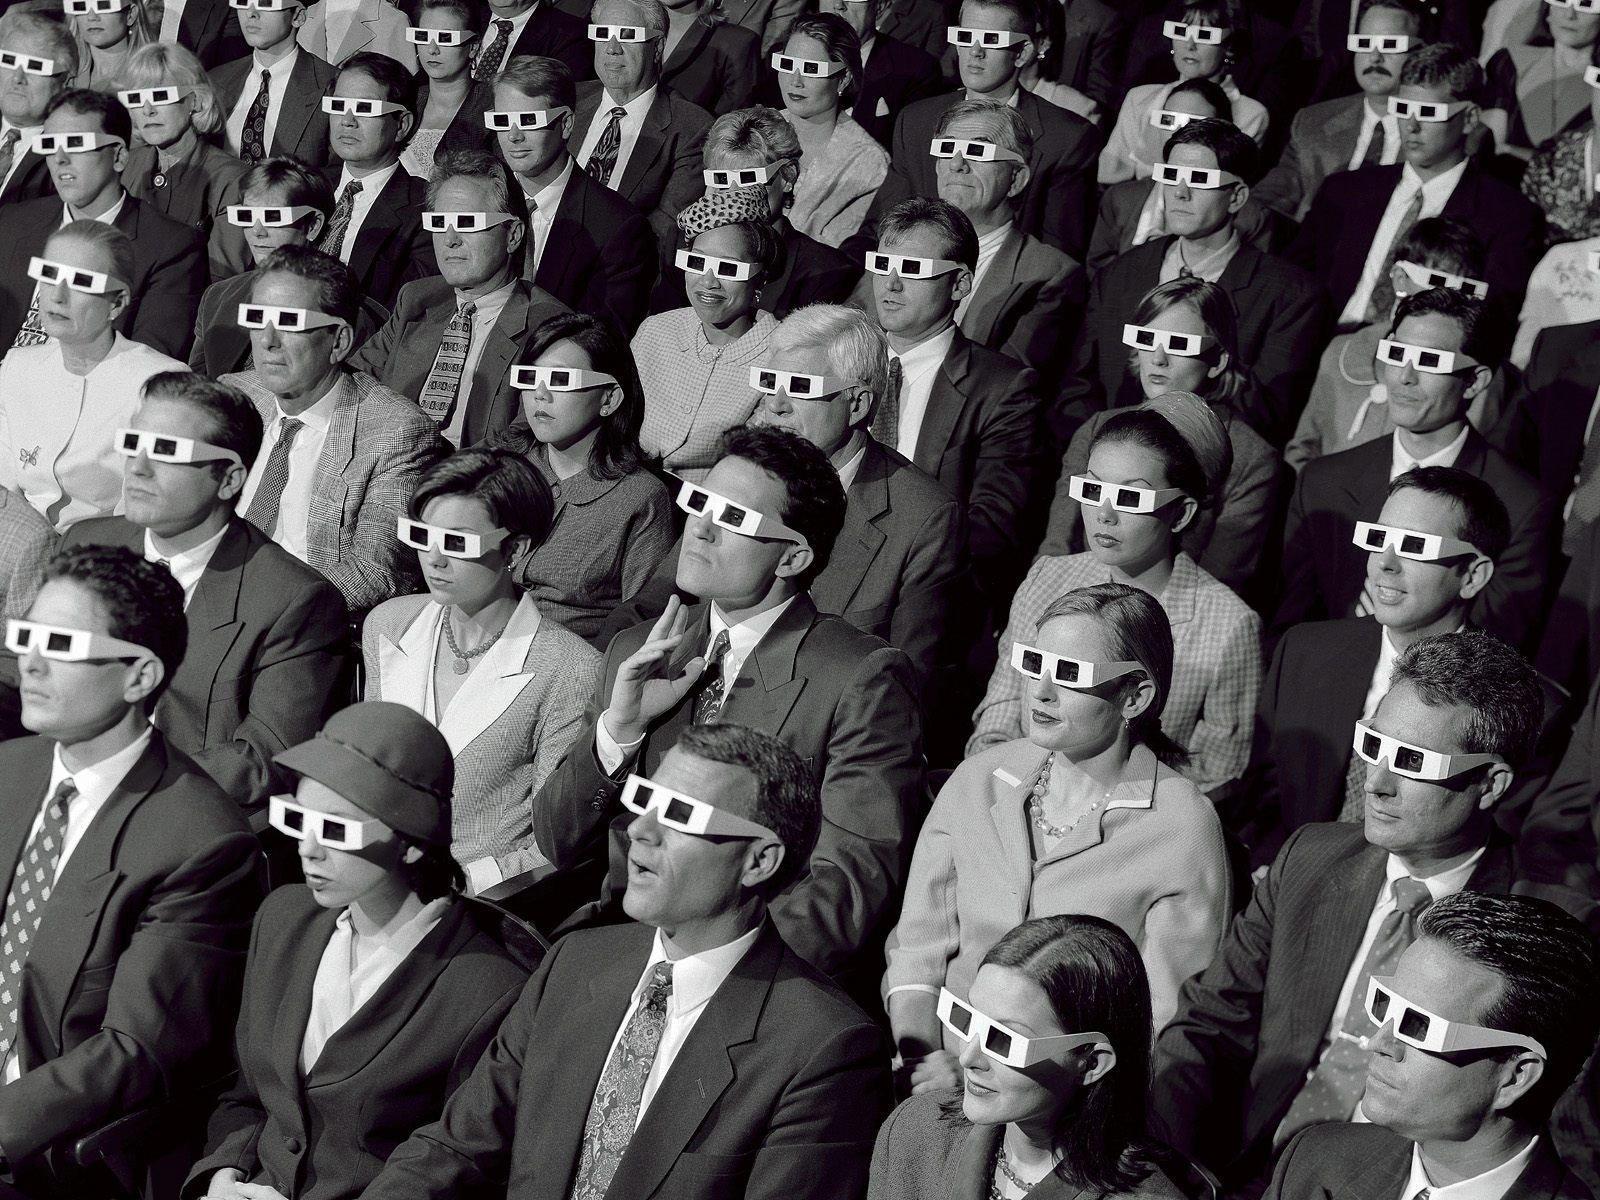 crowd-custom-affinity-audiences